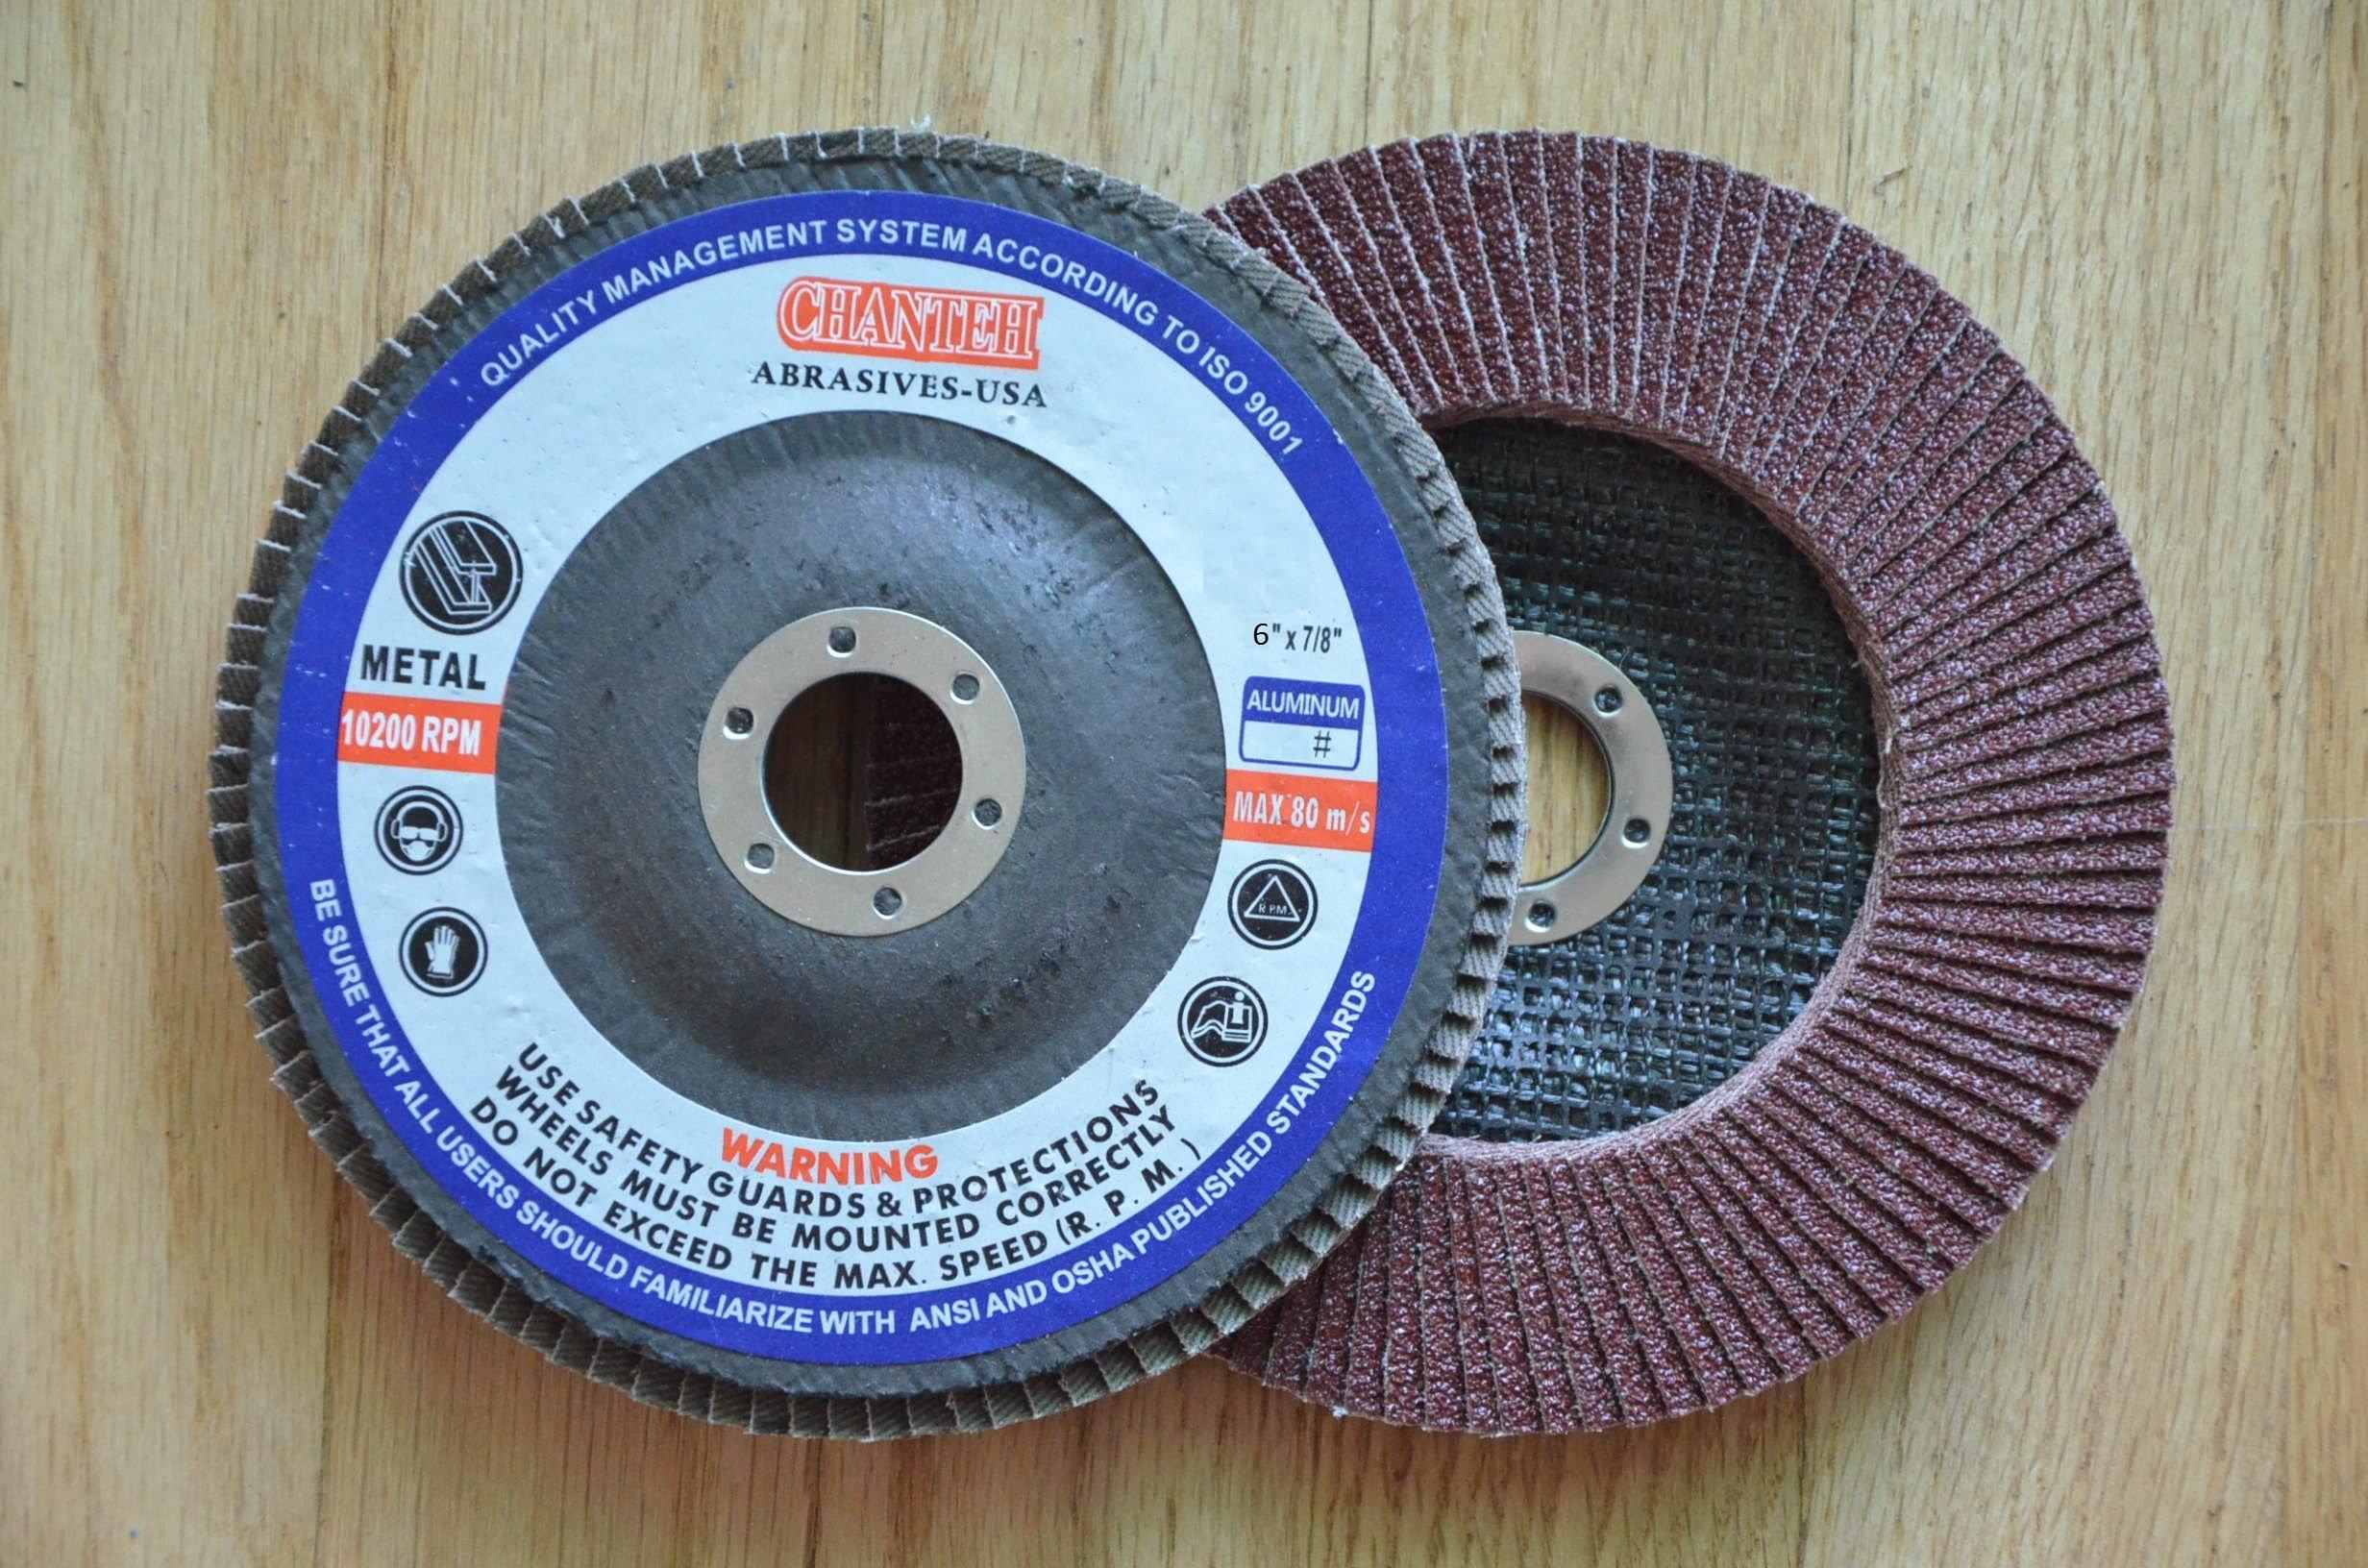 Premium FLAP DISCS 6'' x 7/8'' Aluminum Oxide 60 grit Grinding Wheel for angle grinder - 5pcs Pack